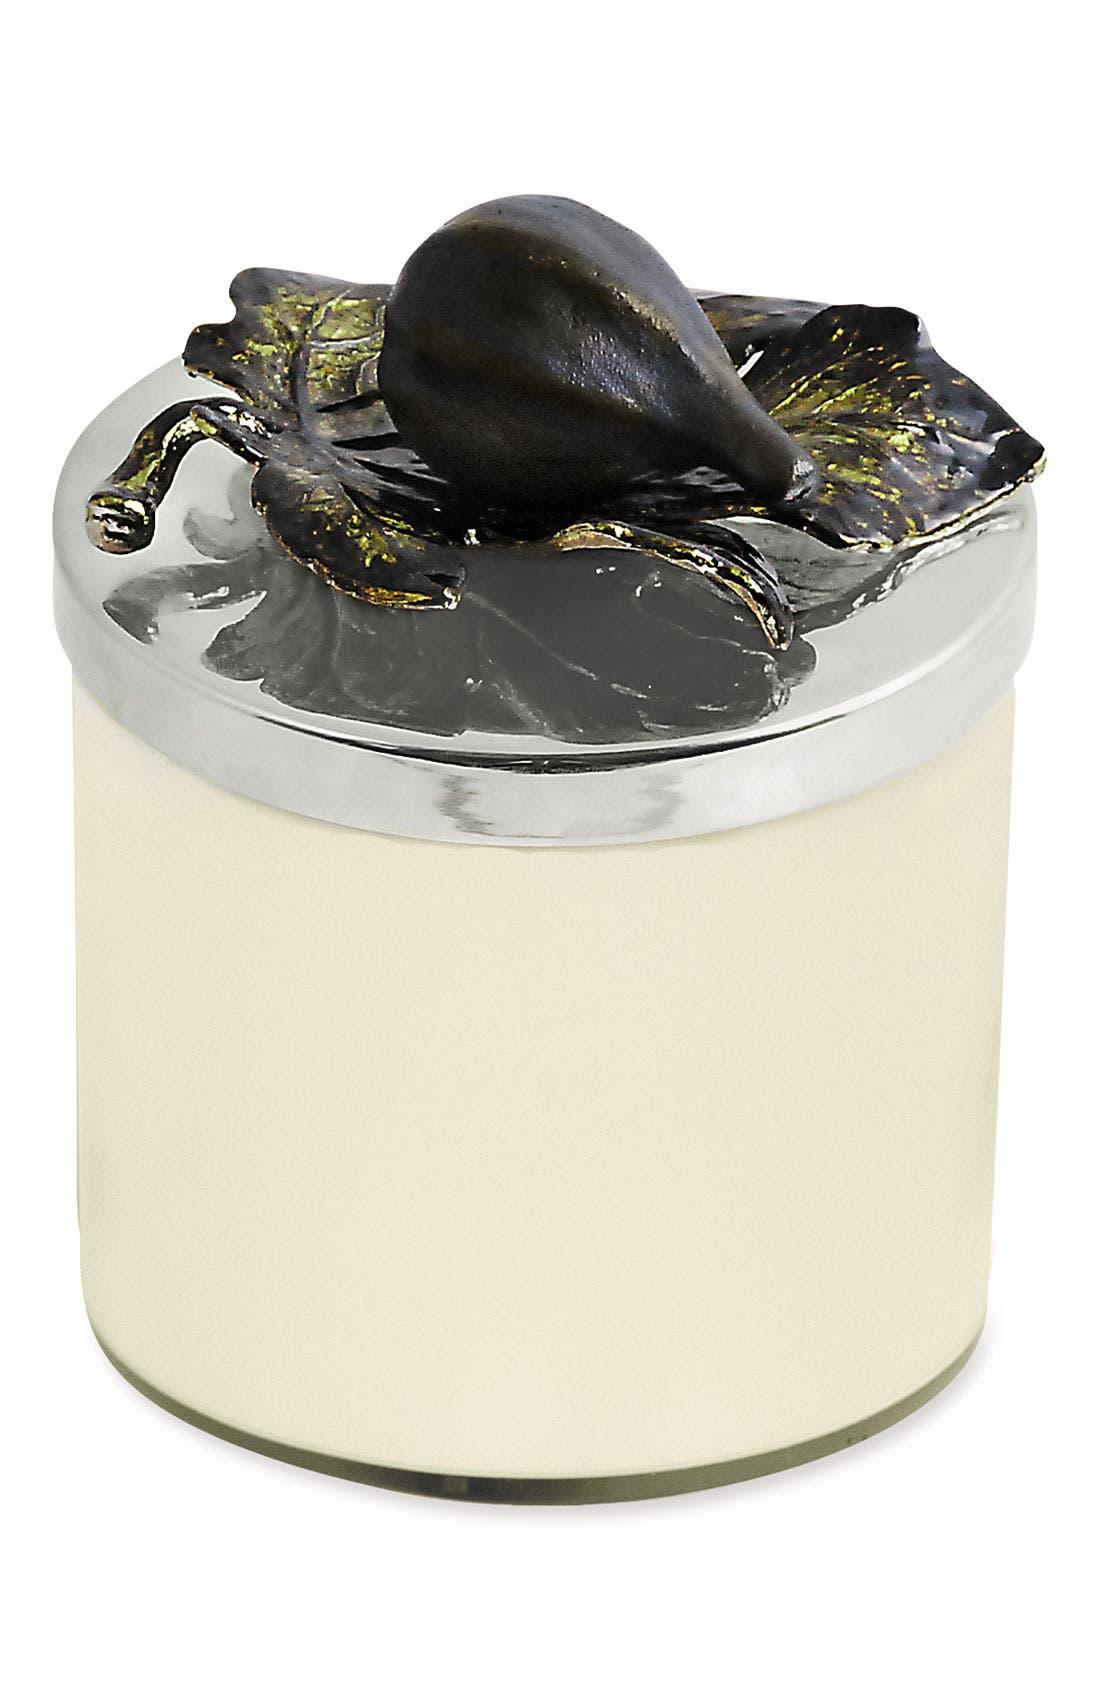 Main Image - Michael Aram 'Fig Leaf' Soy Wax Candle